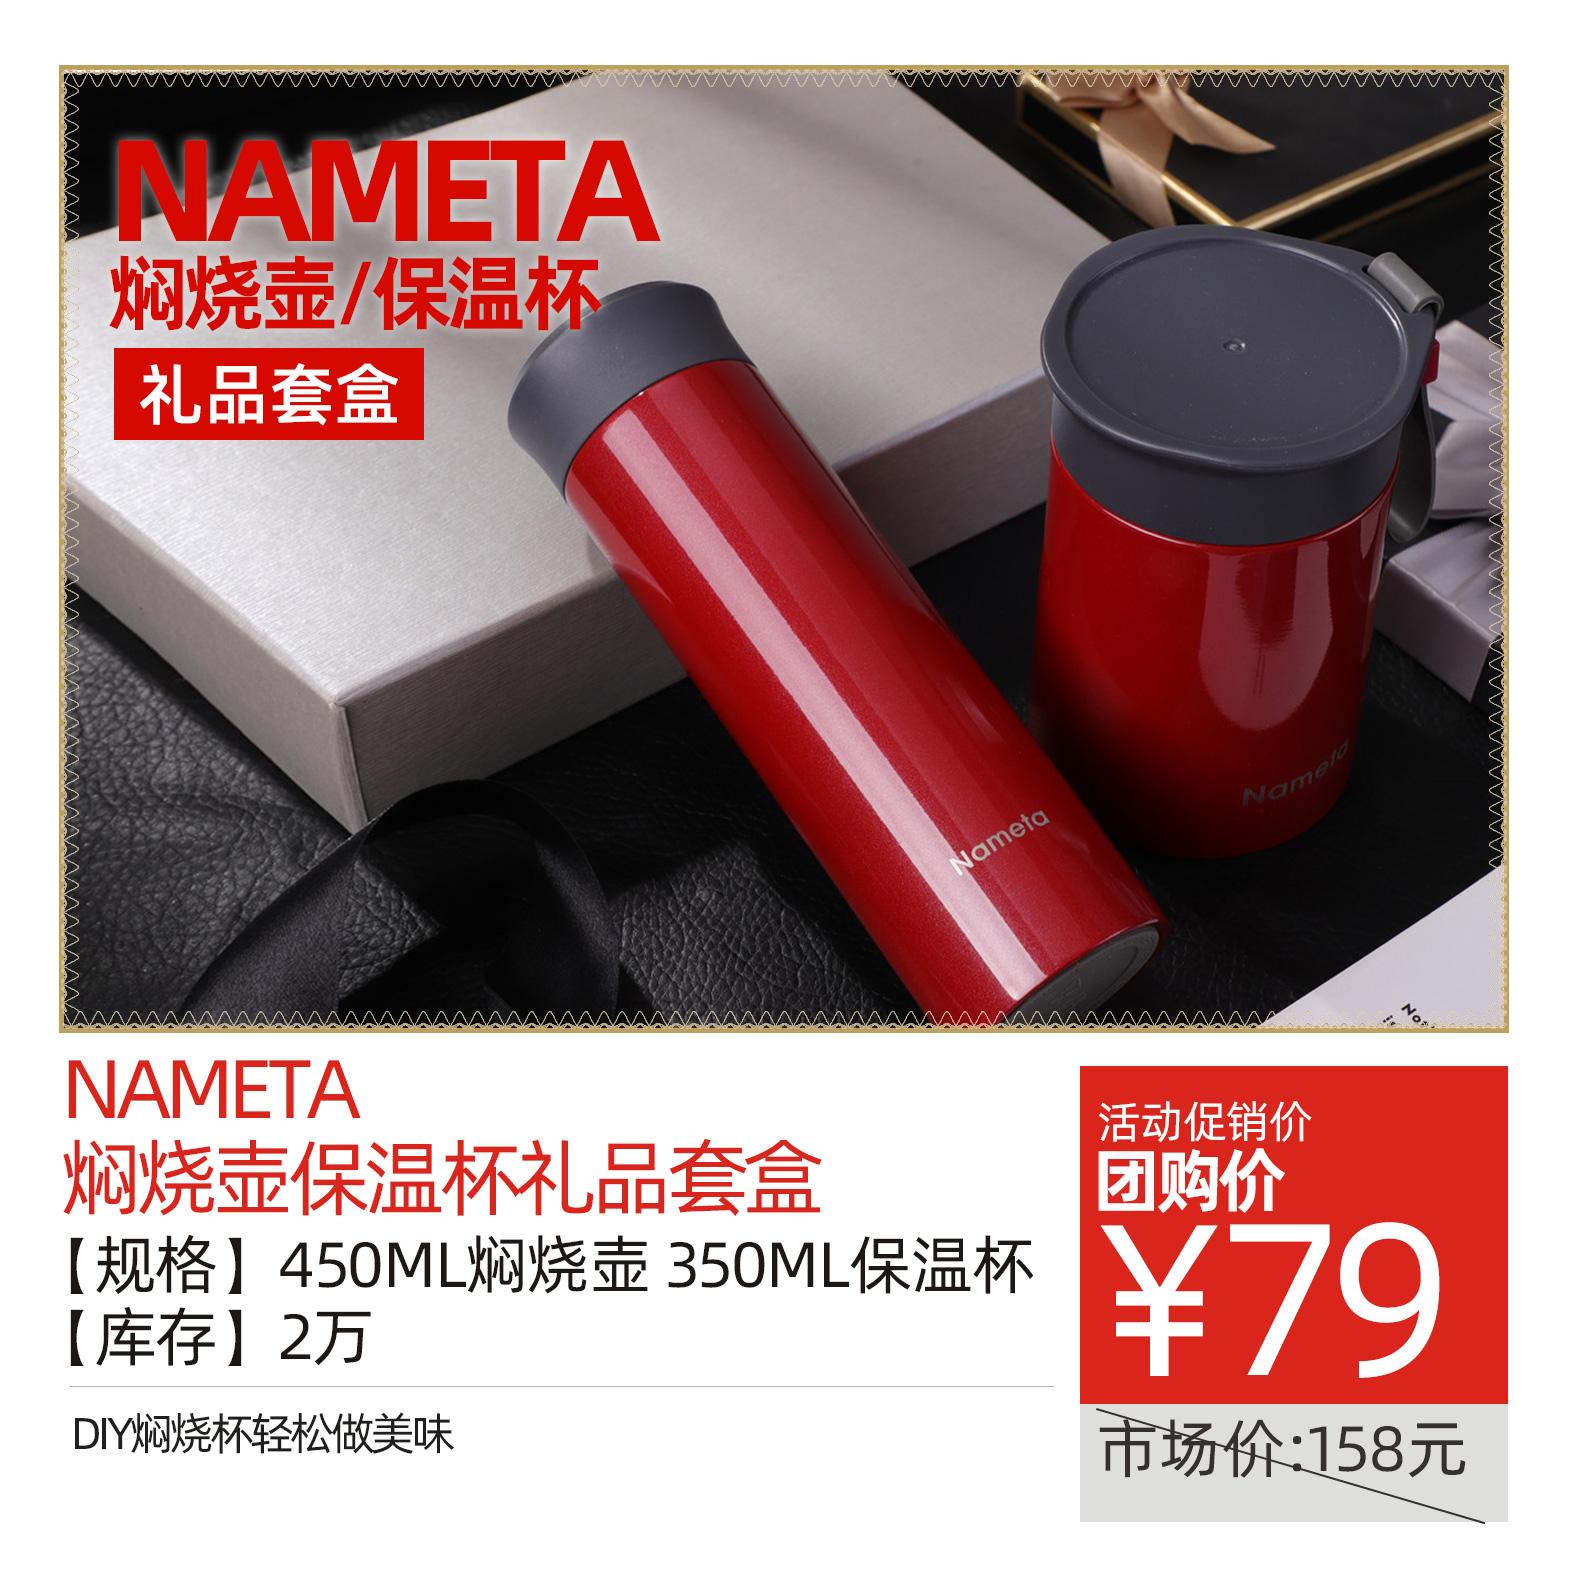 【Nameta】焖烧壶保温杯礼品套盒